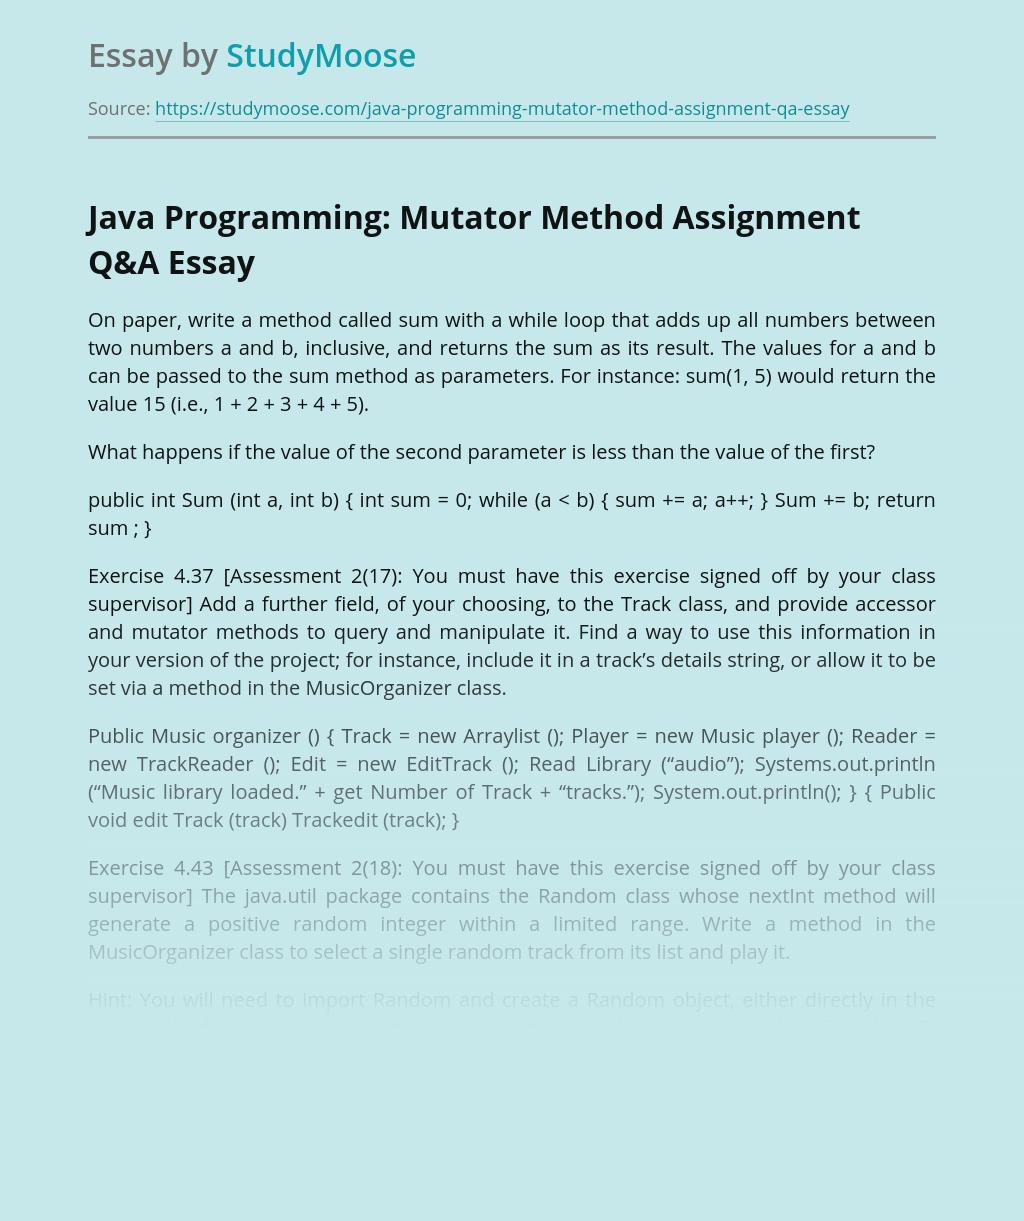 Java Programming: Mutator Method Assignment Q&A